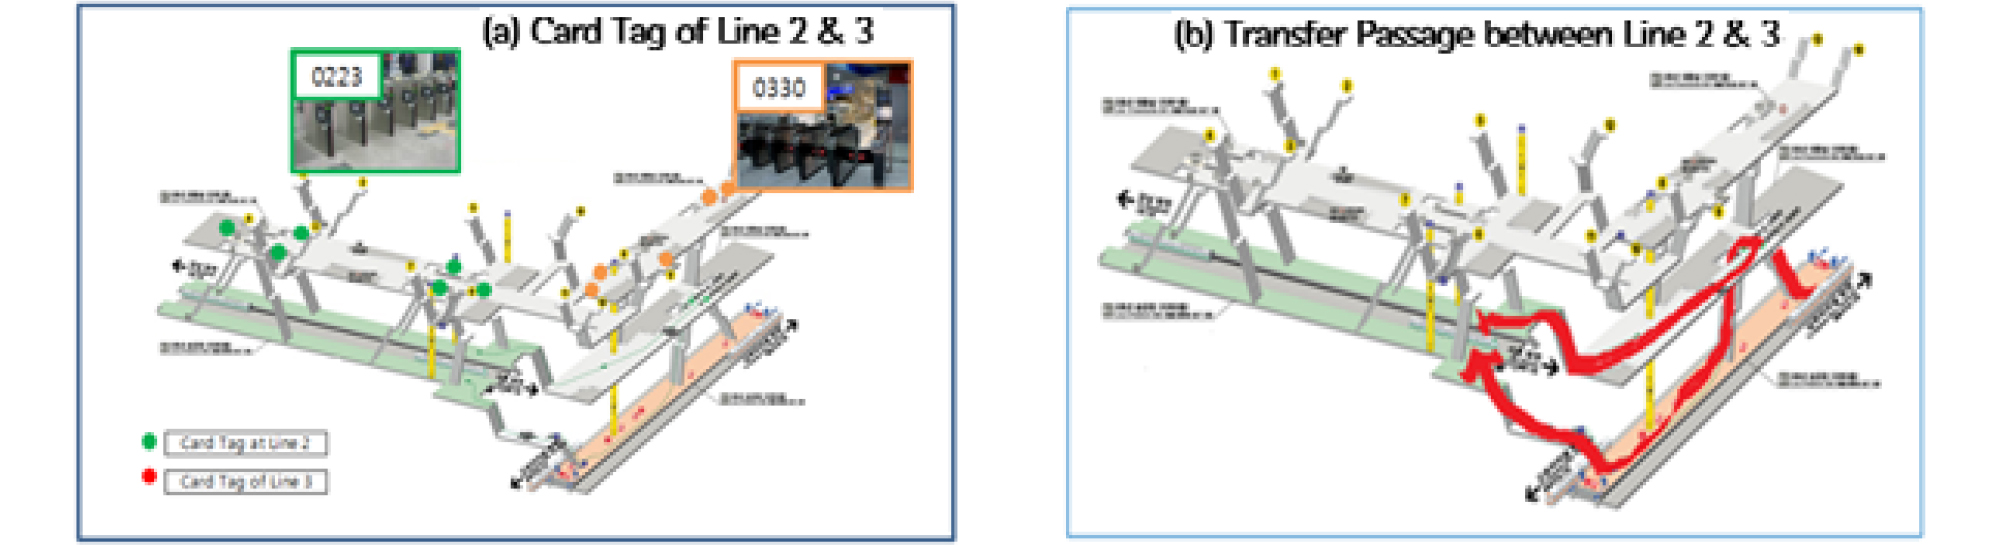 http://static.apub.kr/journalsite/sites/ksce/2018-038-05/N0110380507/images/Figure_KSCE_38_5_07_F2.jpg